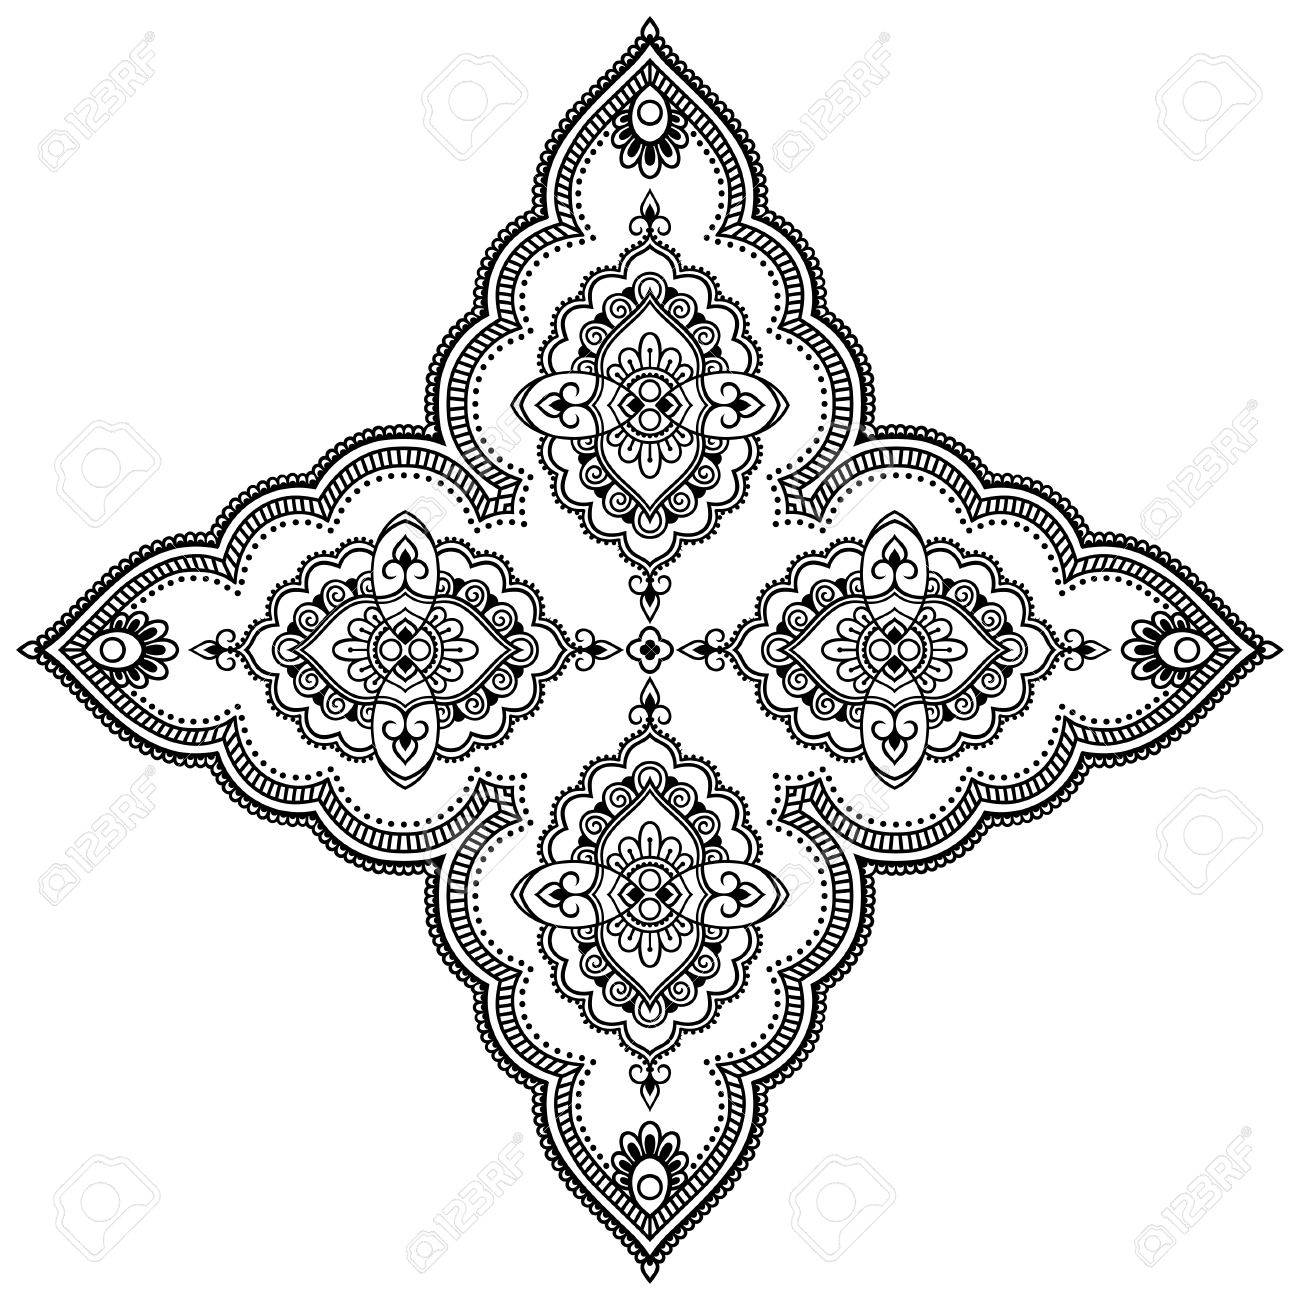 vector henna tatoo mandala mehndi style decorative pattern in rh 123rf com henna vector art henna vector pattern